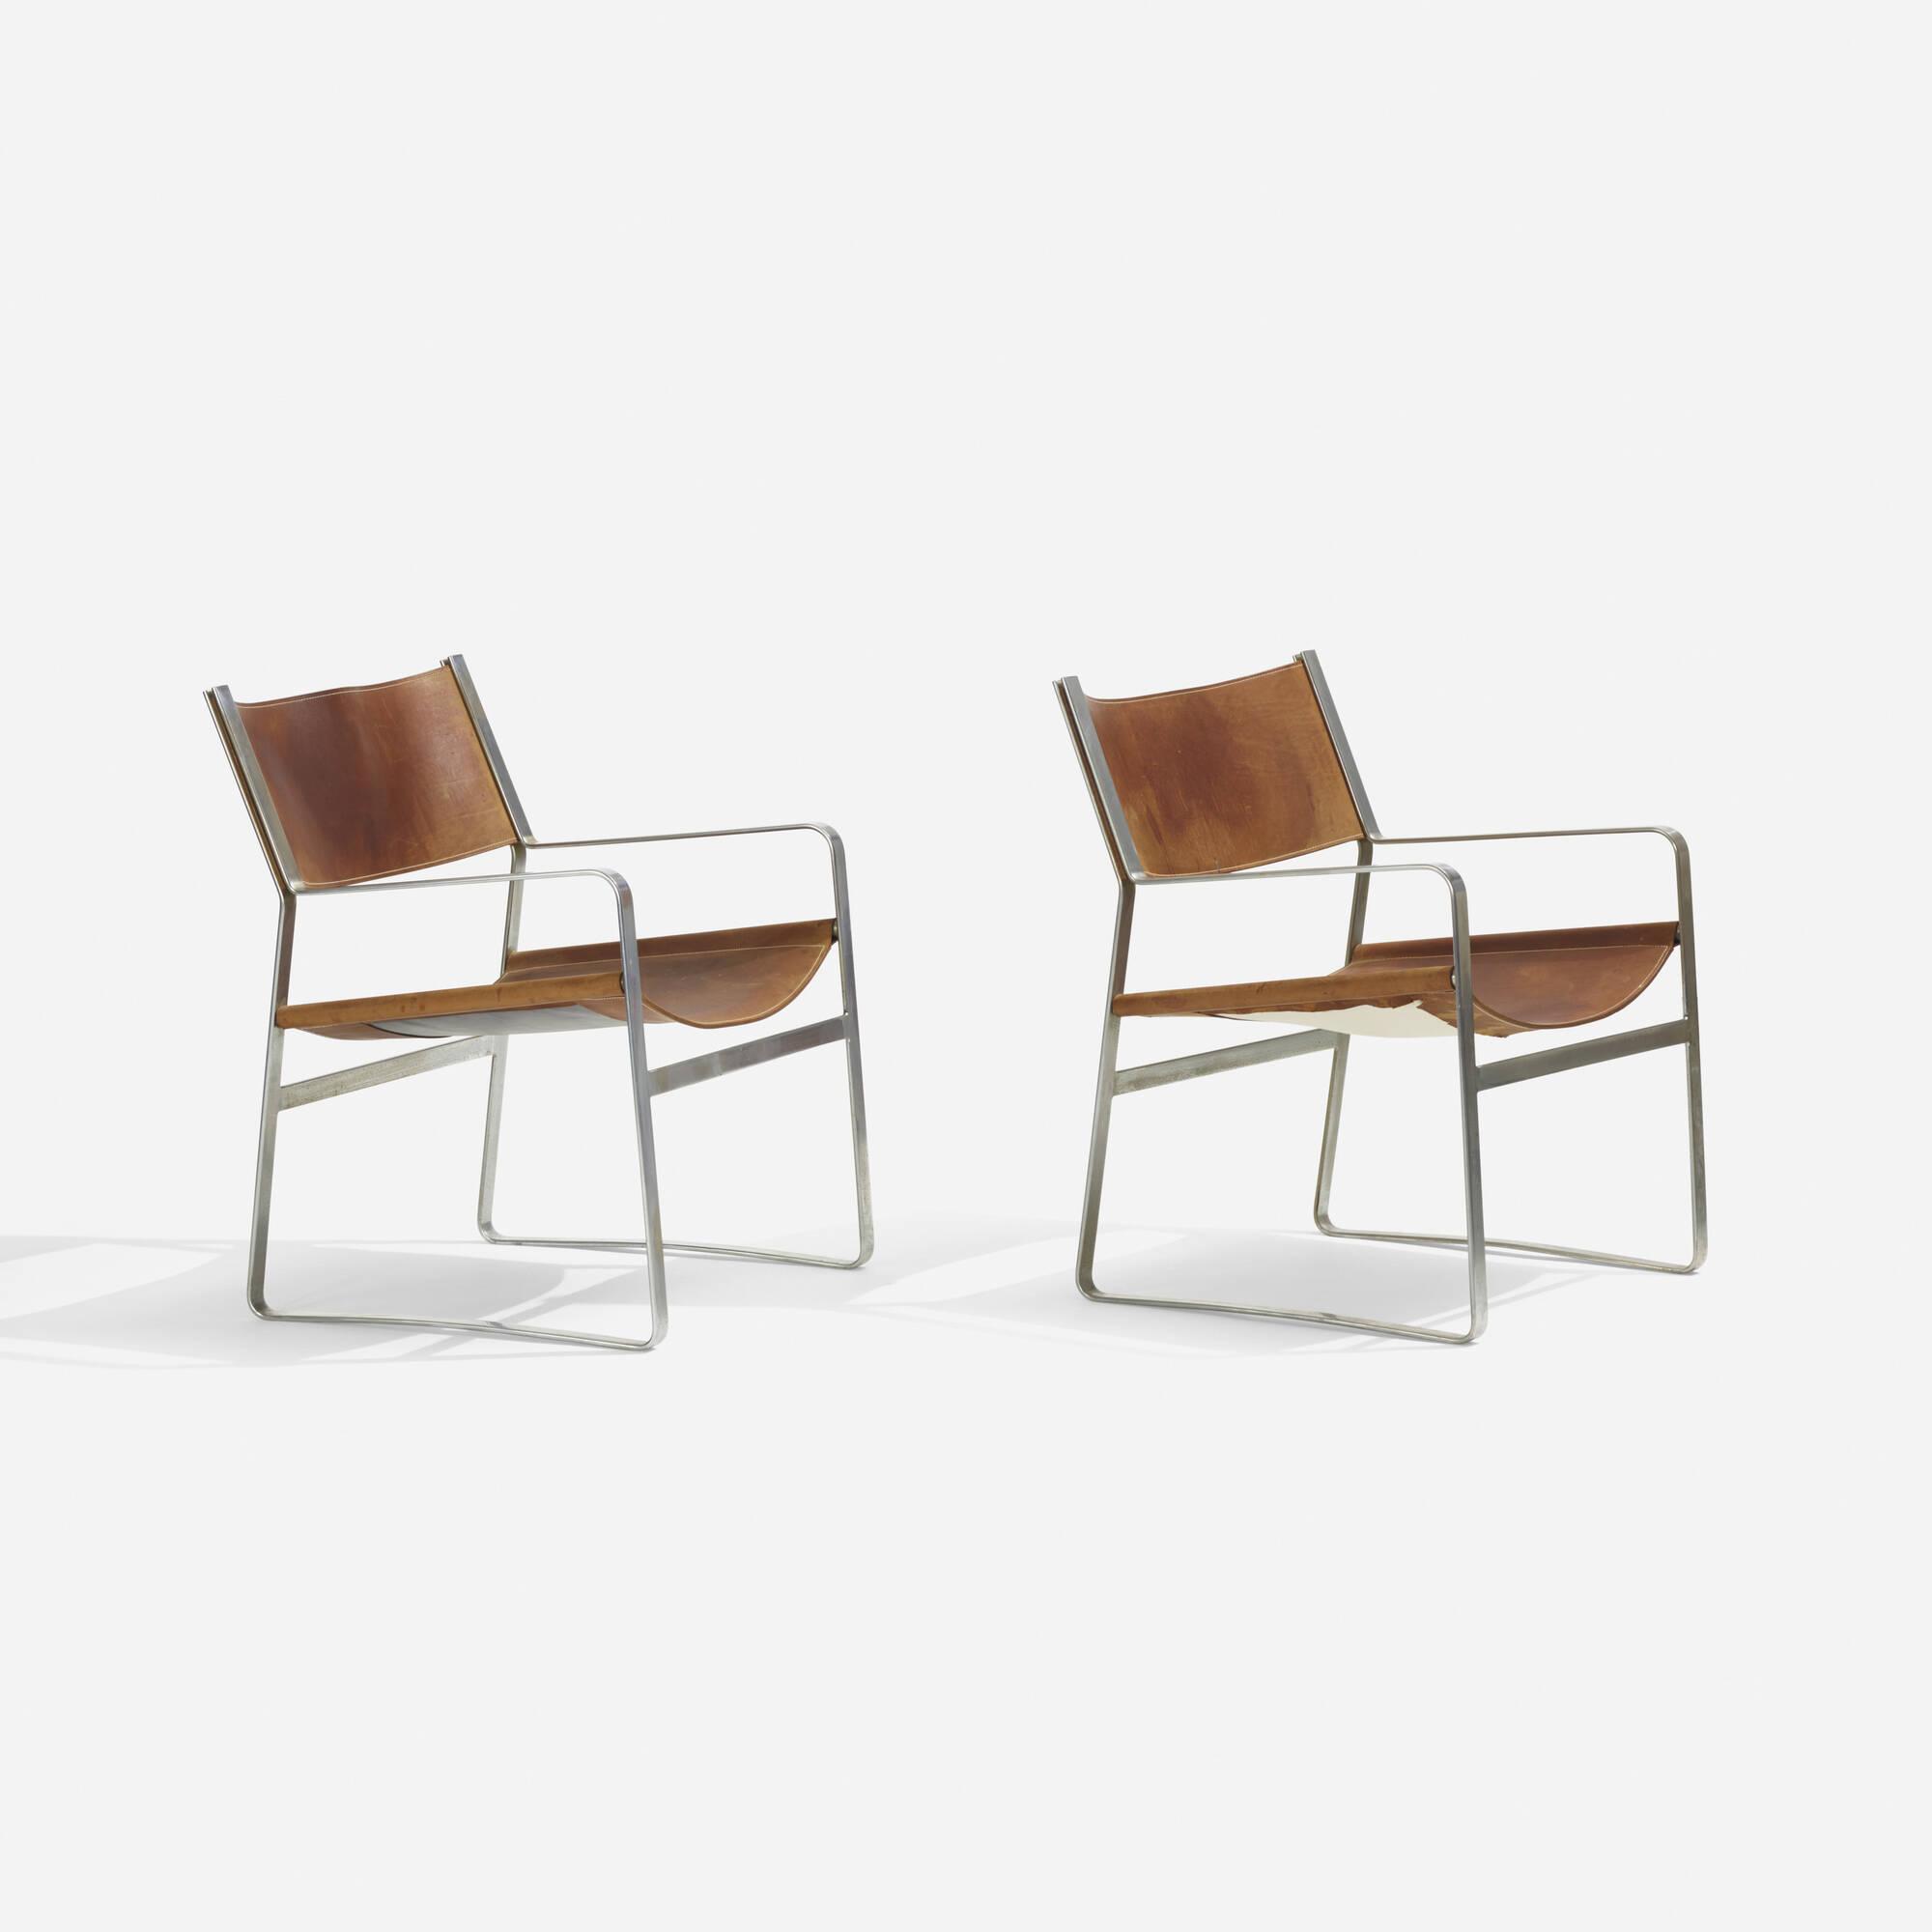 136: Hans J. Wegner / armchairs model JH 812, pair (1 of 2)